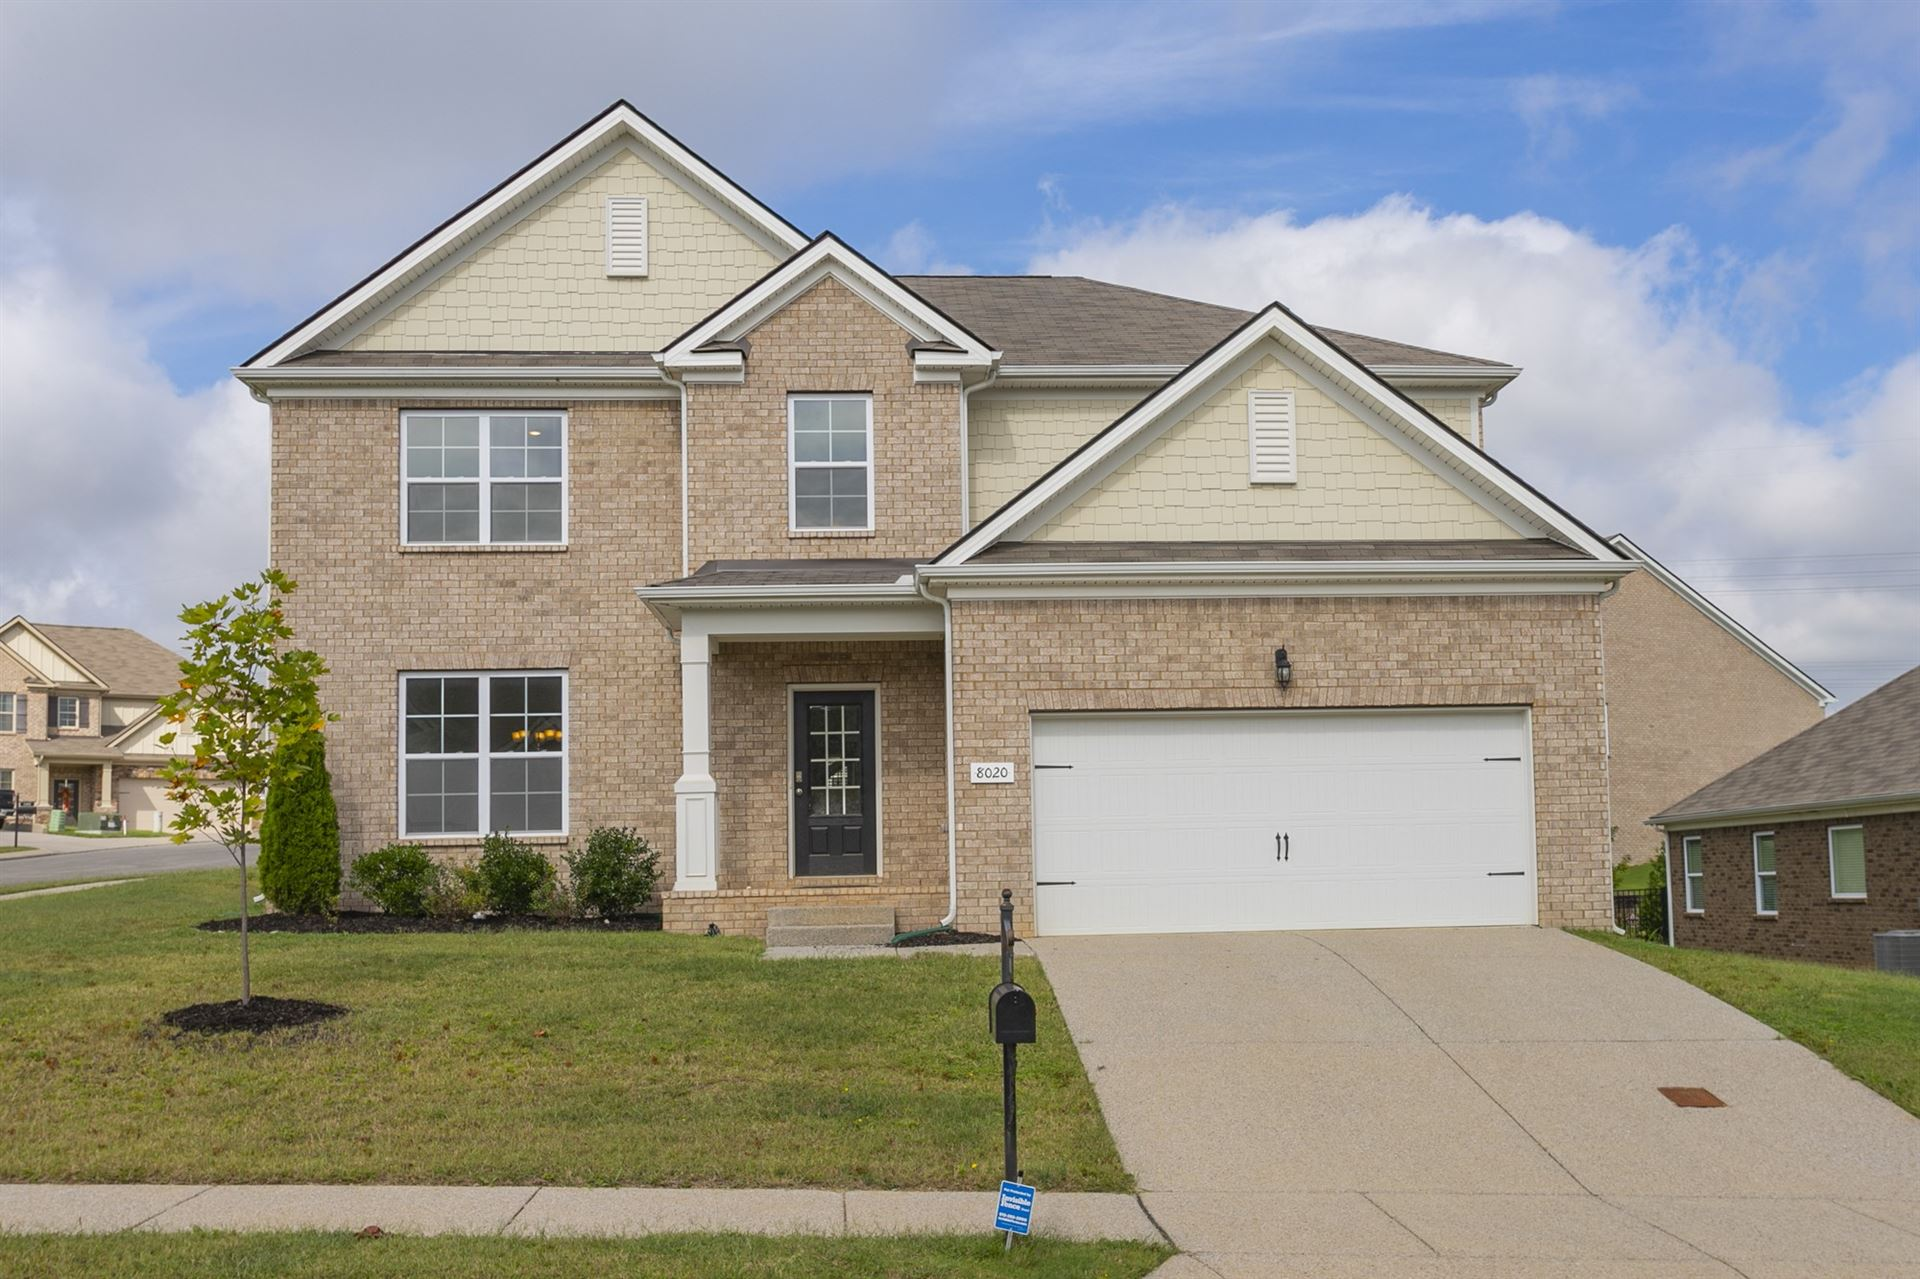 8020 Forest Hills Drive, Spring Hill, TN 37174 - MLS#: 2296080